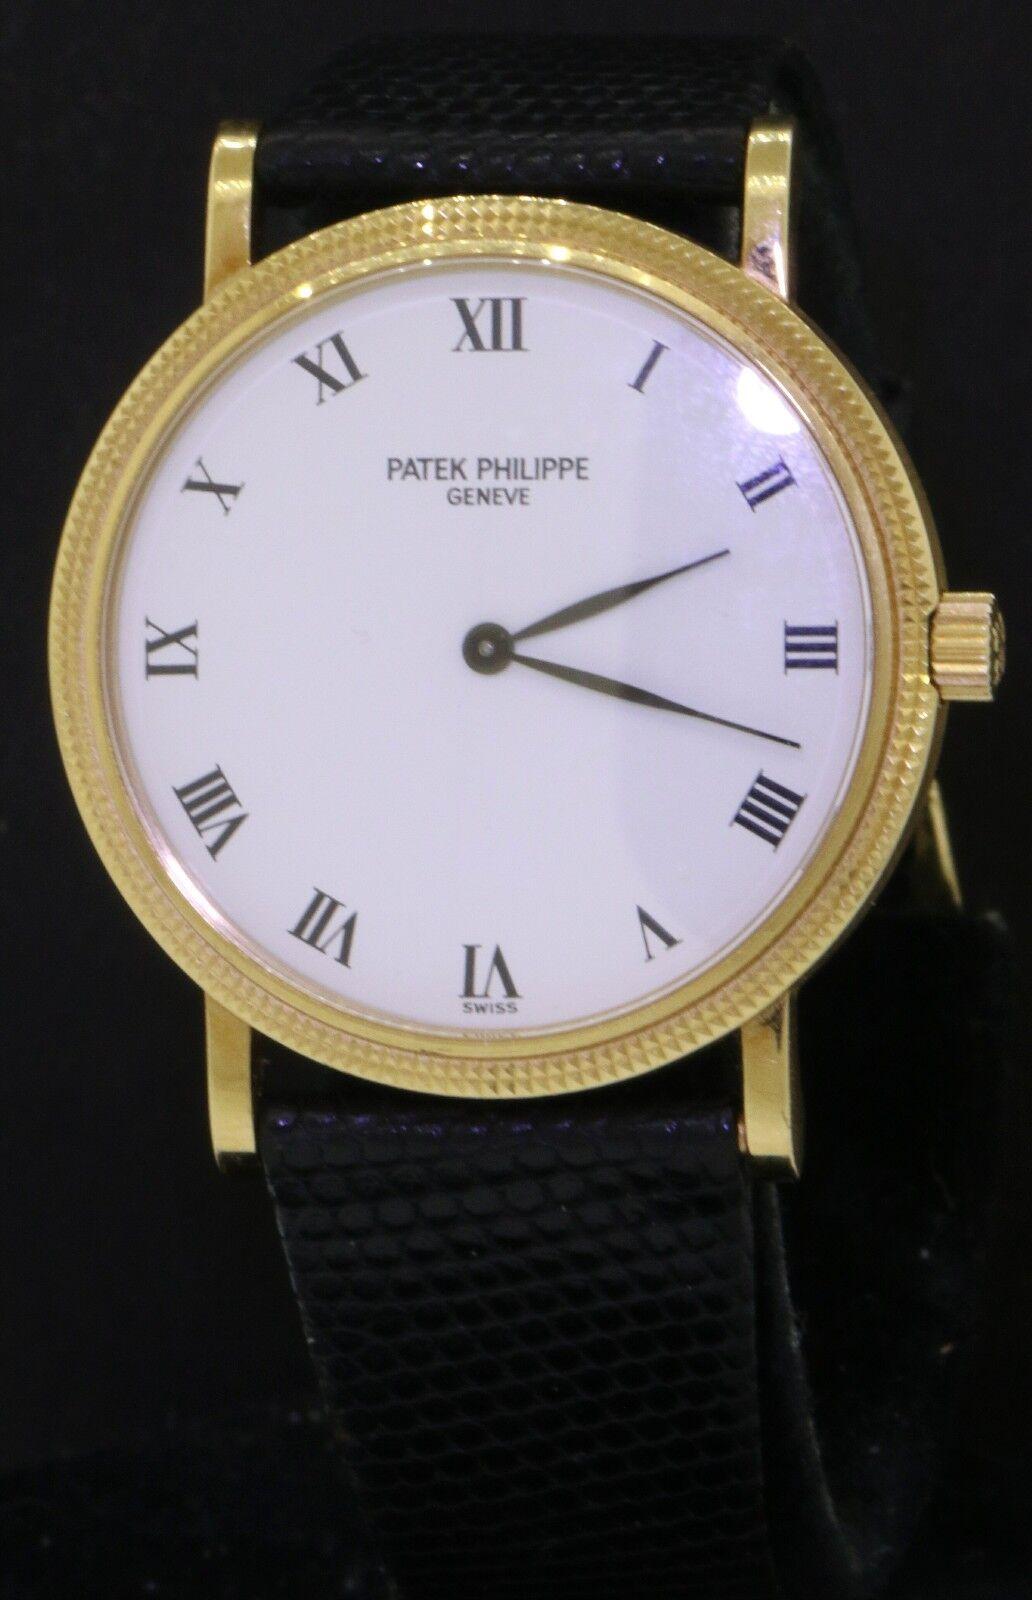 $8100.00 - Patek Philippe Calatrava 3992 18K gold automatic men's dinner watch w/ B & P